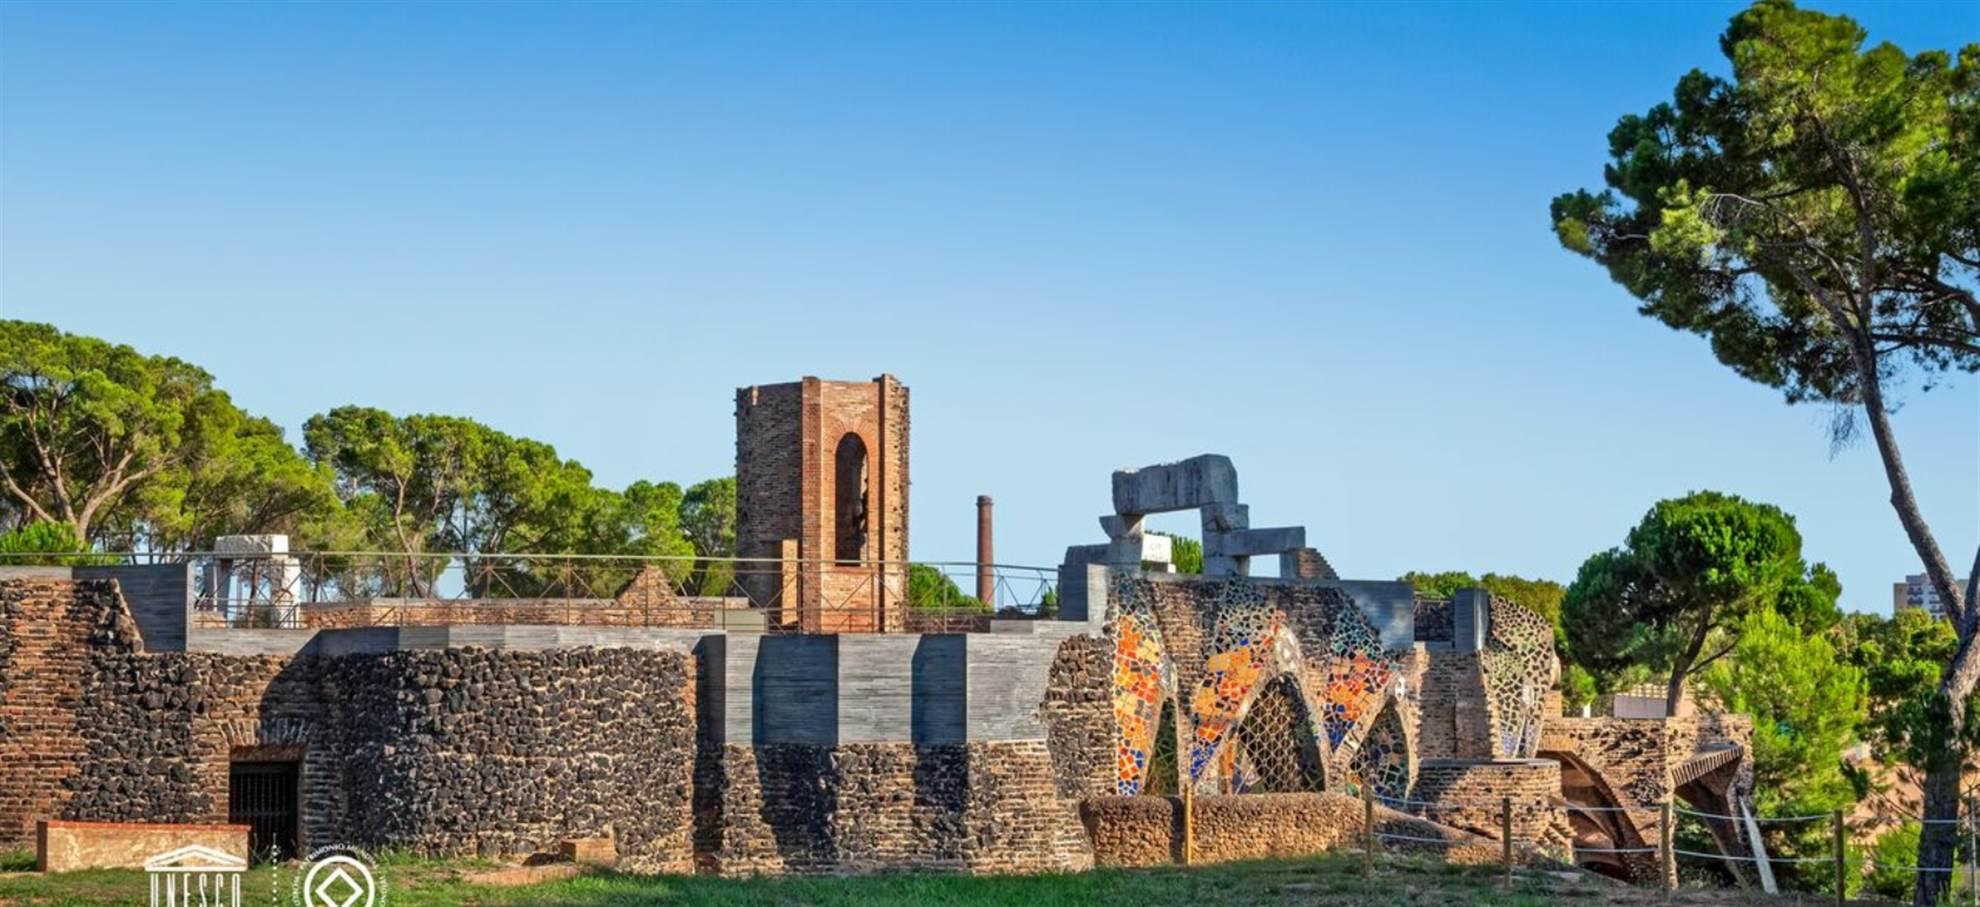 Gaudis Krypta in Colonia Güell: Besuch + Audioguide